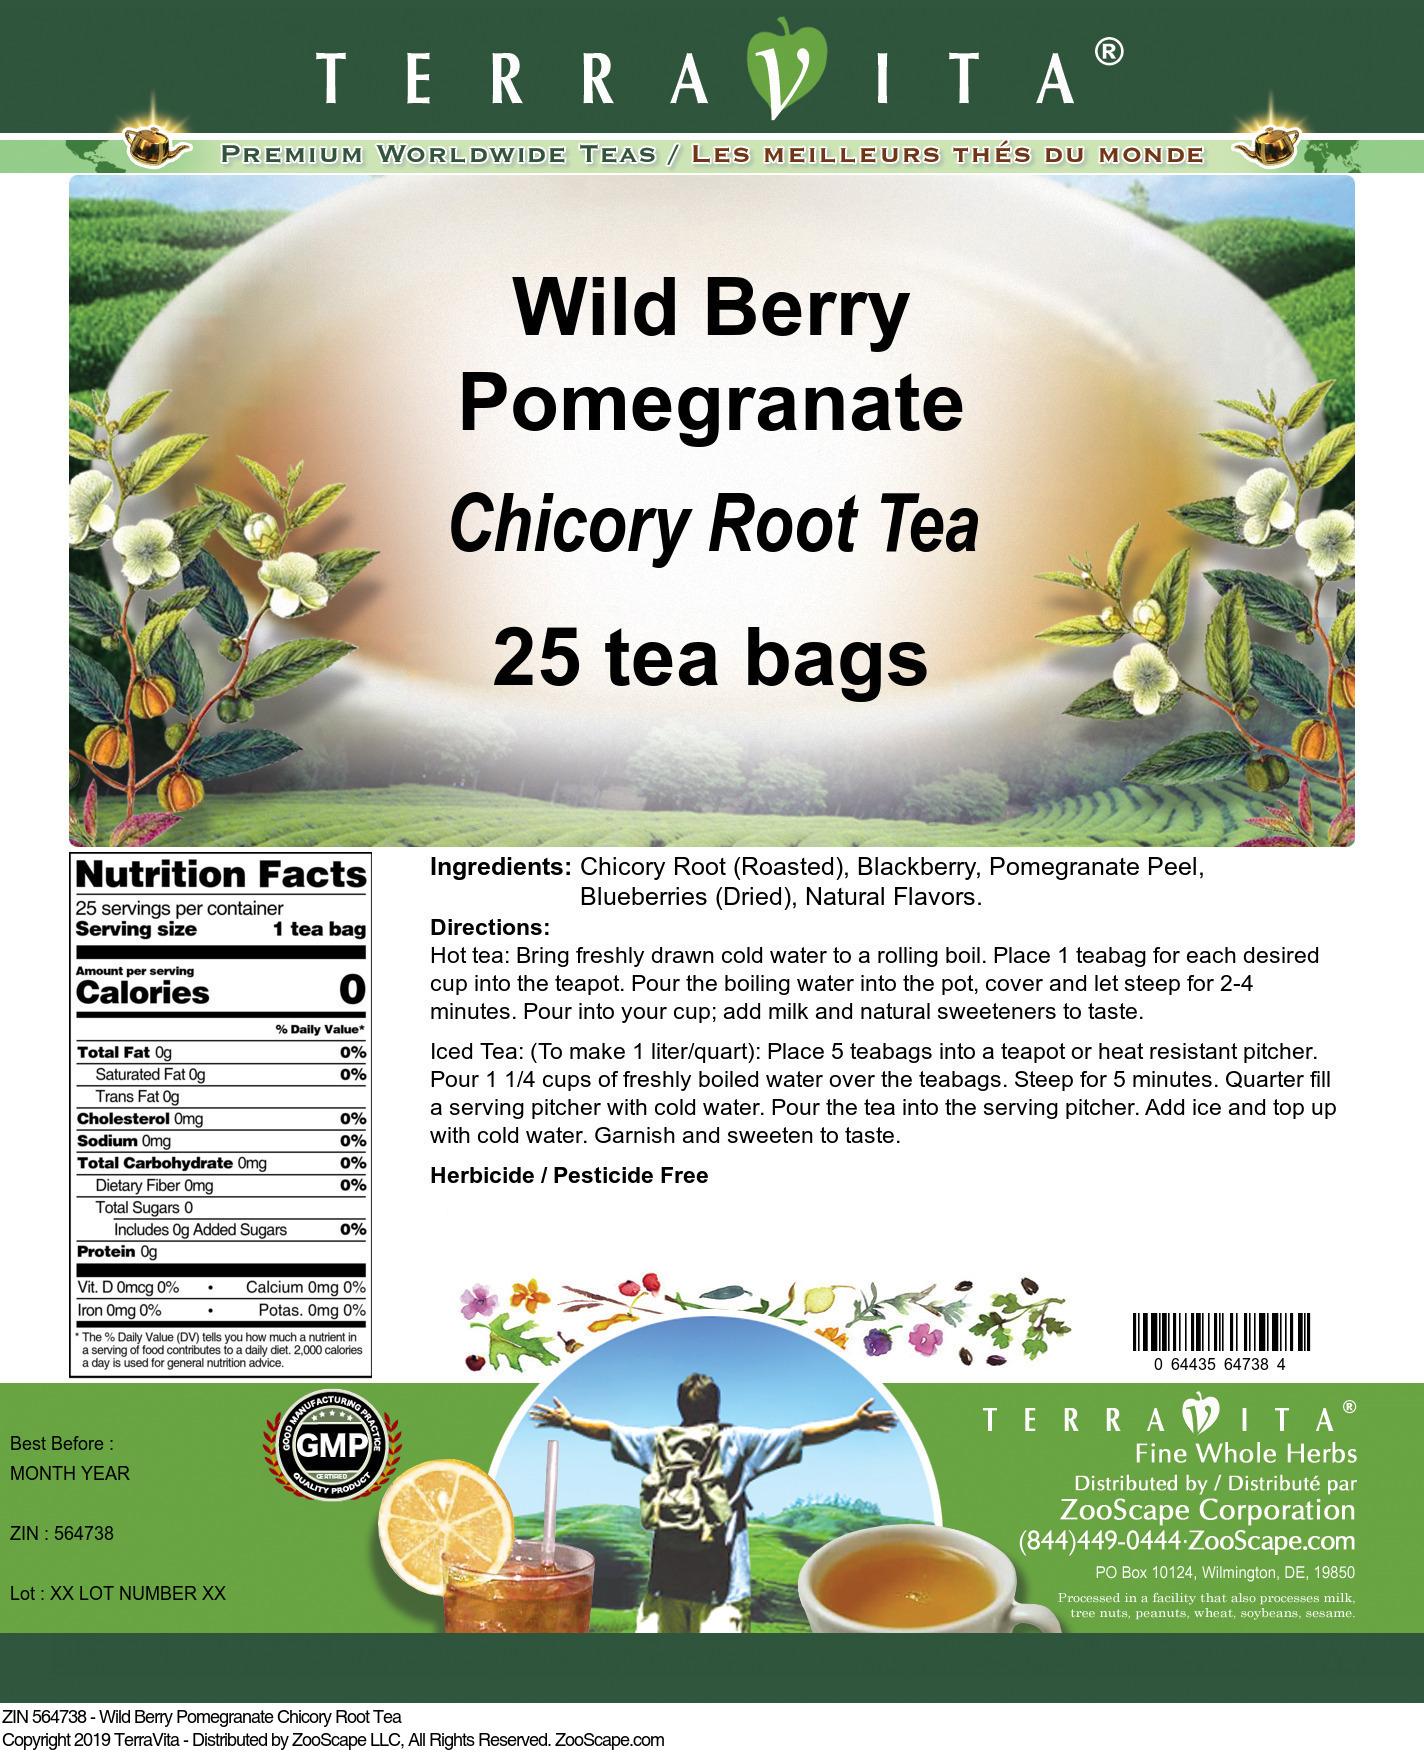 Wild Berry Pomegranate Chicory Root